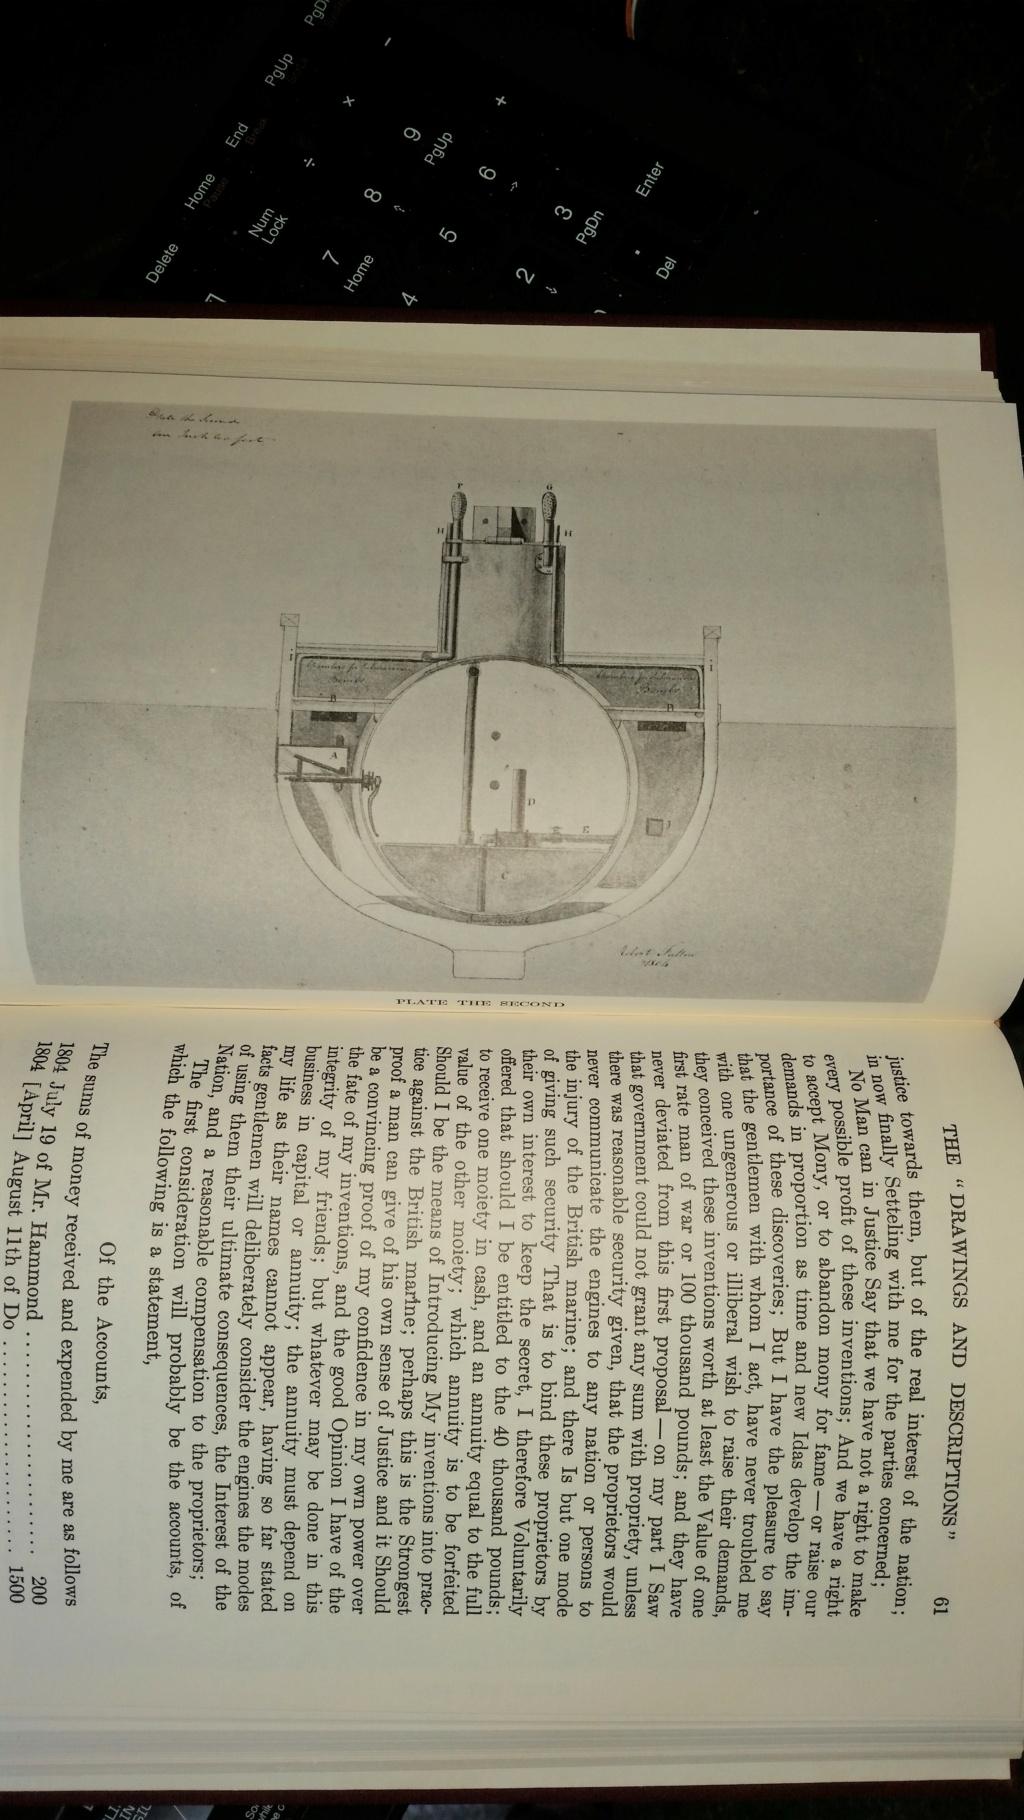 Nautilus II by Robert Fulton 20190614